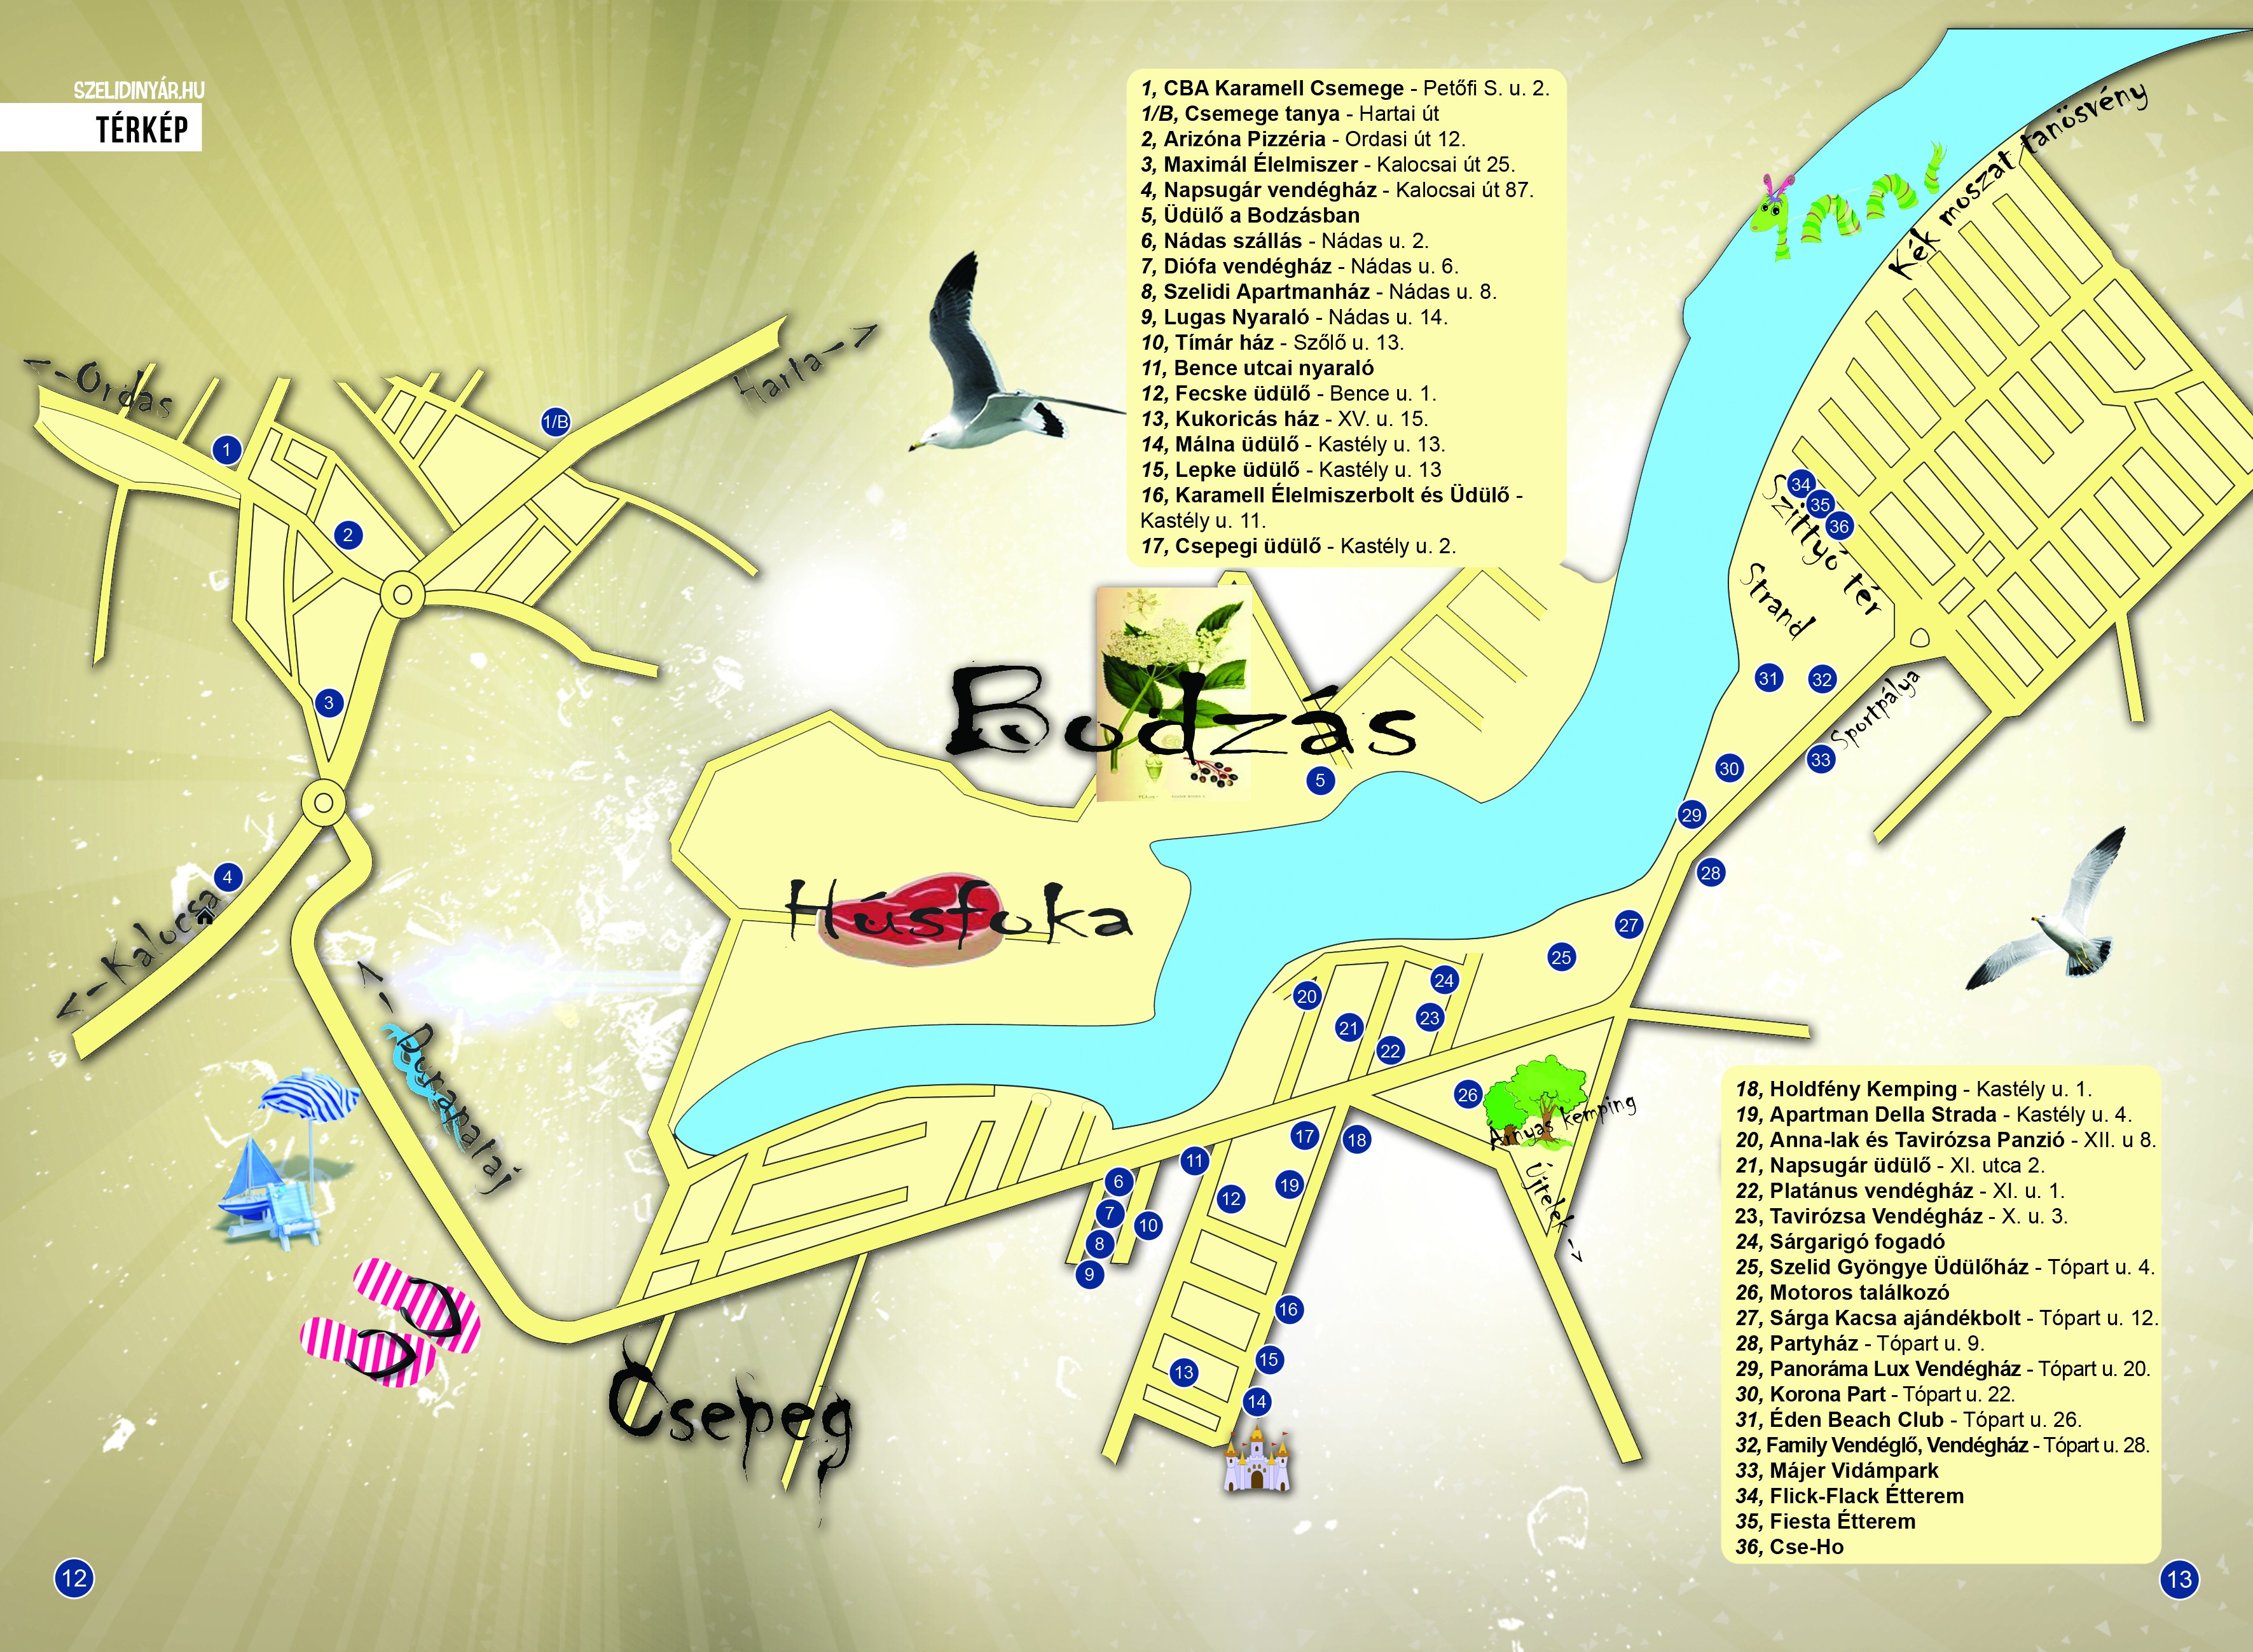 szelidi tó térkép Szelidi tó Térkép | Szelidi Nyár szelidi tó térkép